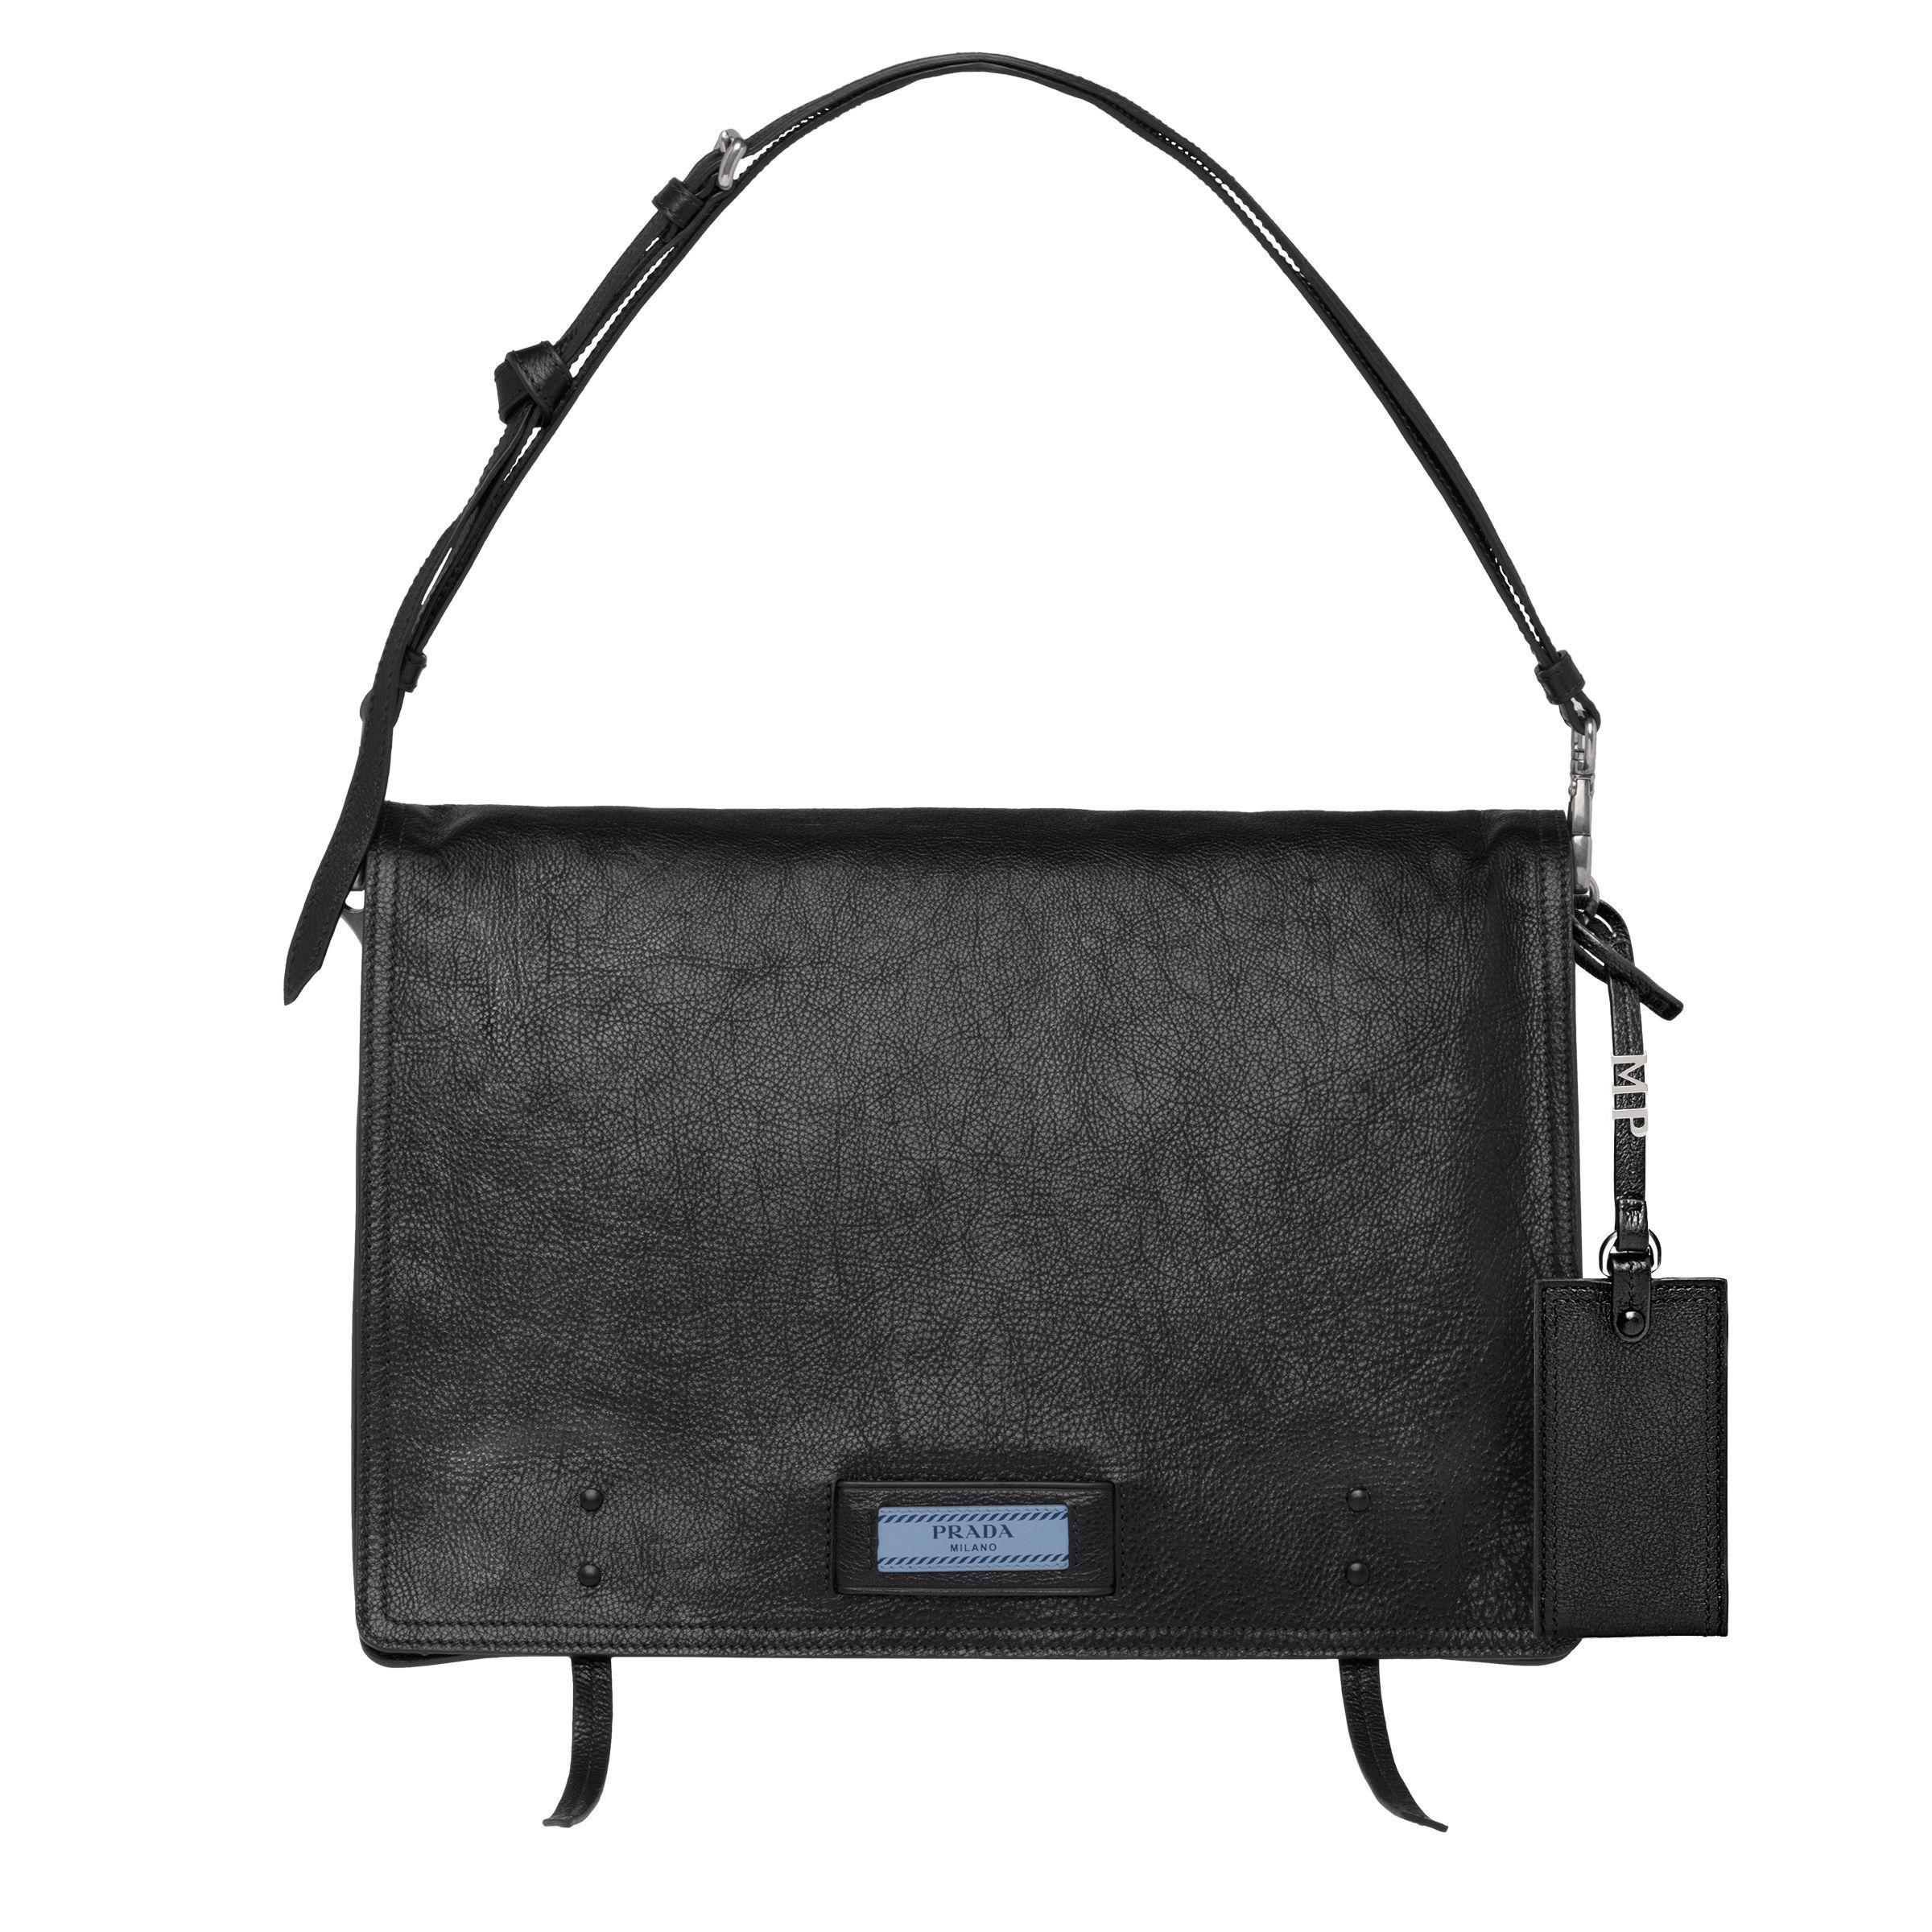 8b96d0c6d290 Prada - Black Etiquette Leather Shoulder Bag - Lyst. View fullscreen